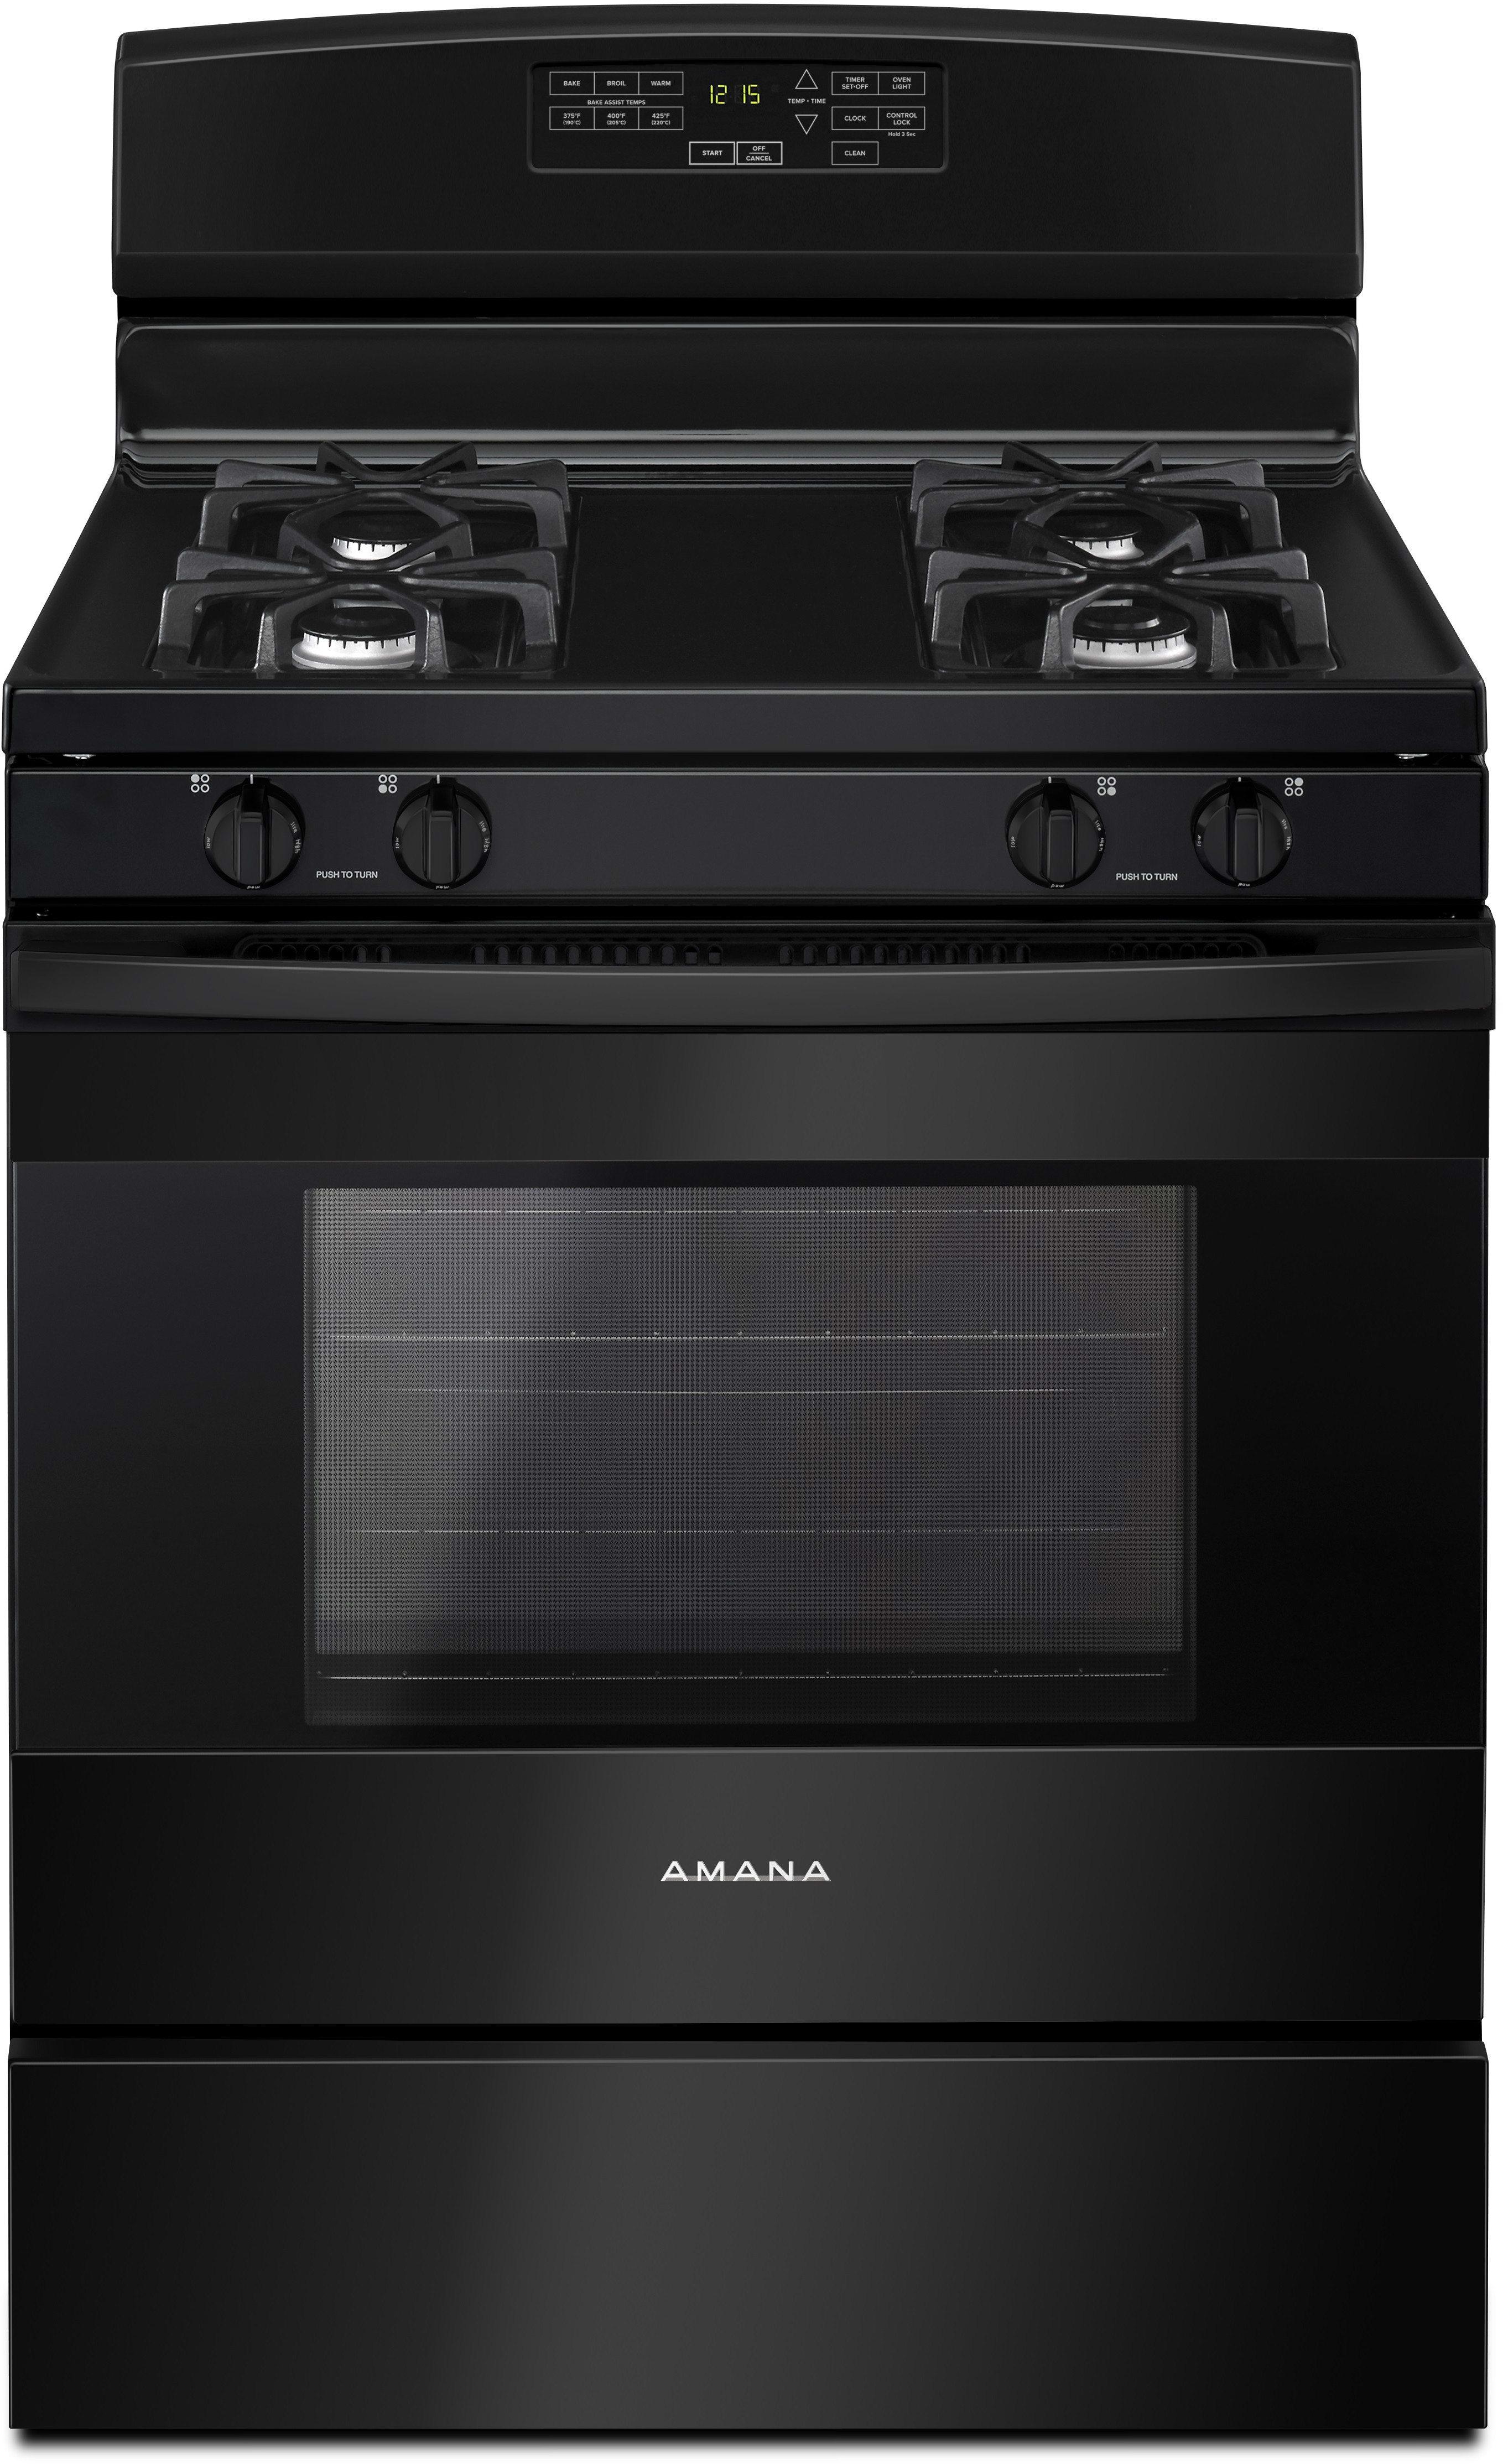 Amana Agr6603sfb 30 Inch Gas Range With Bake Assist